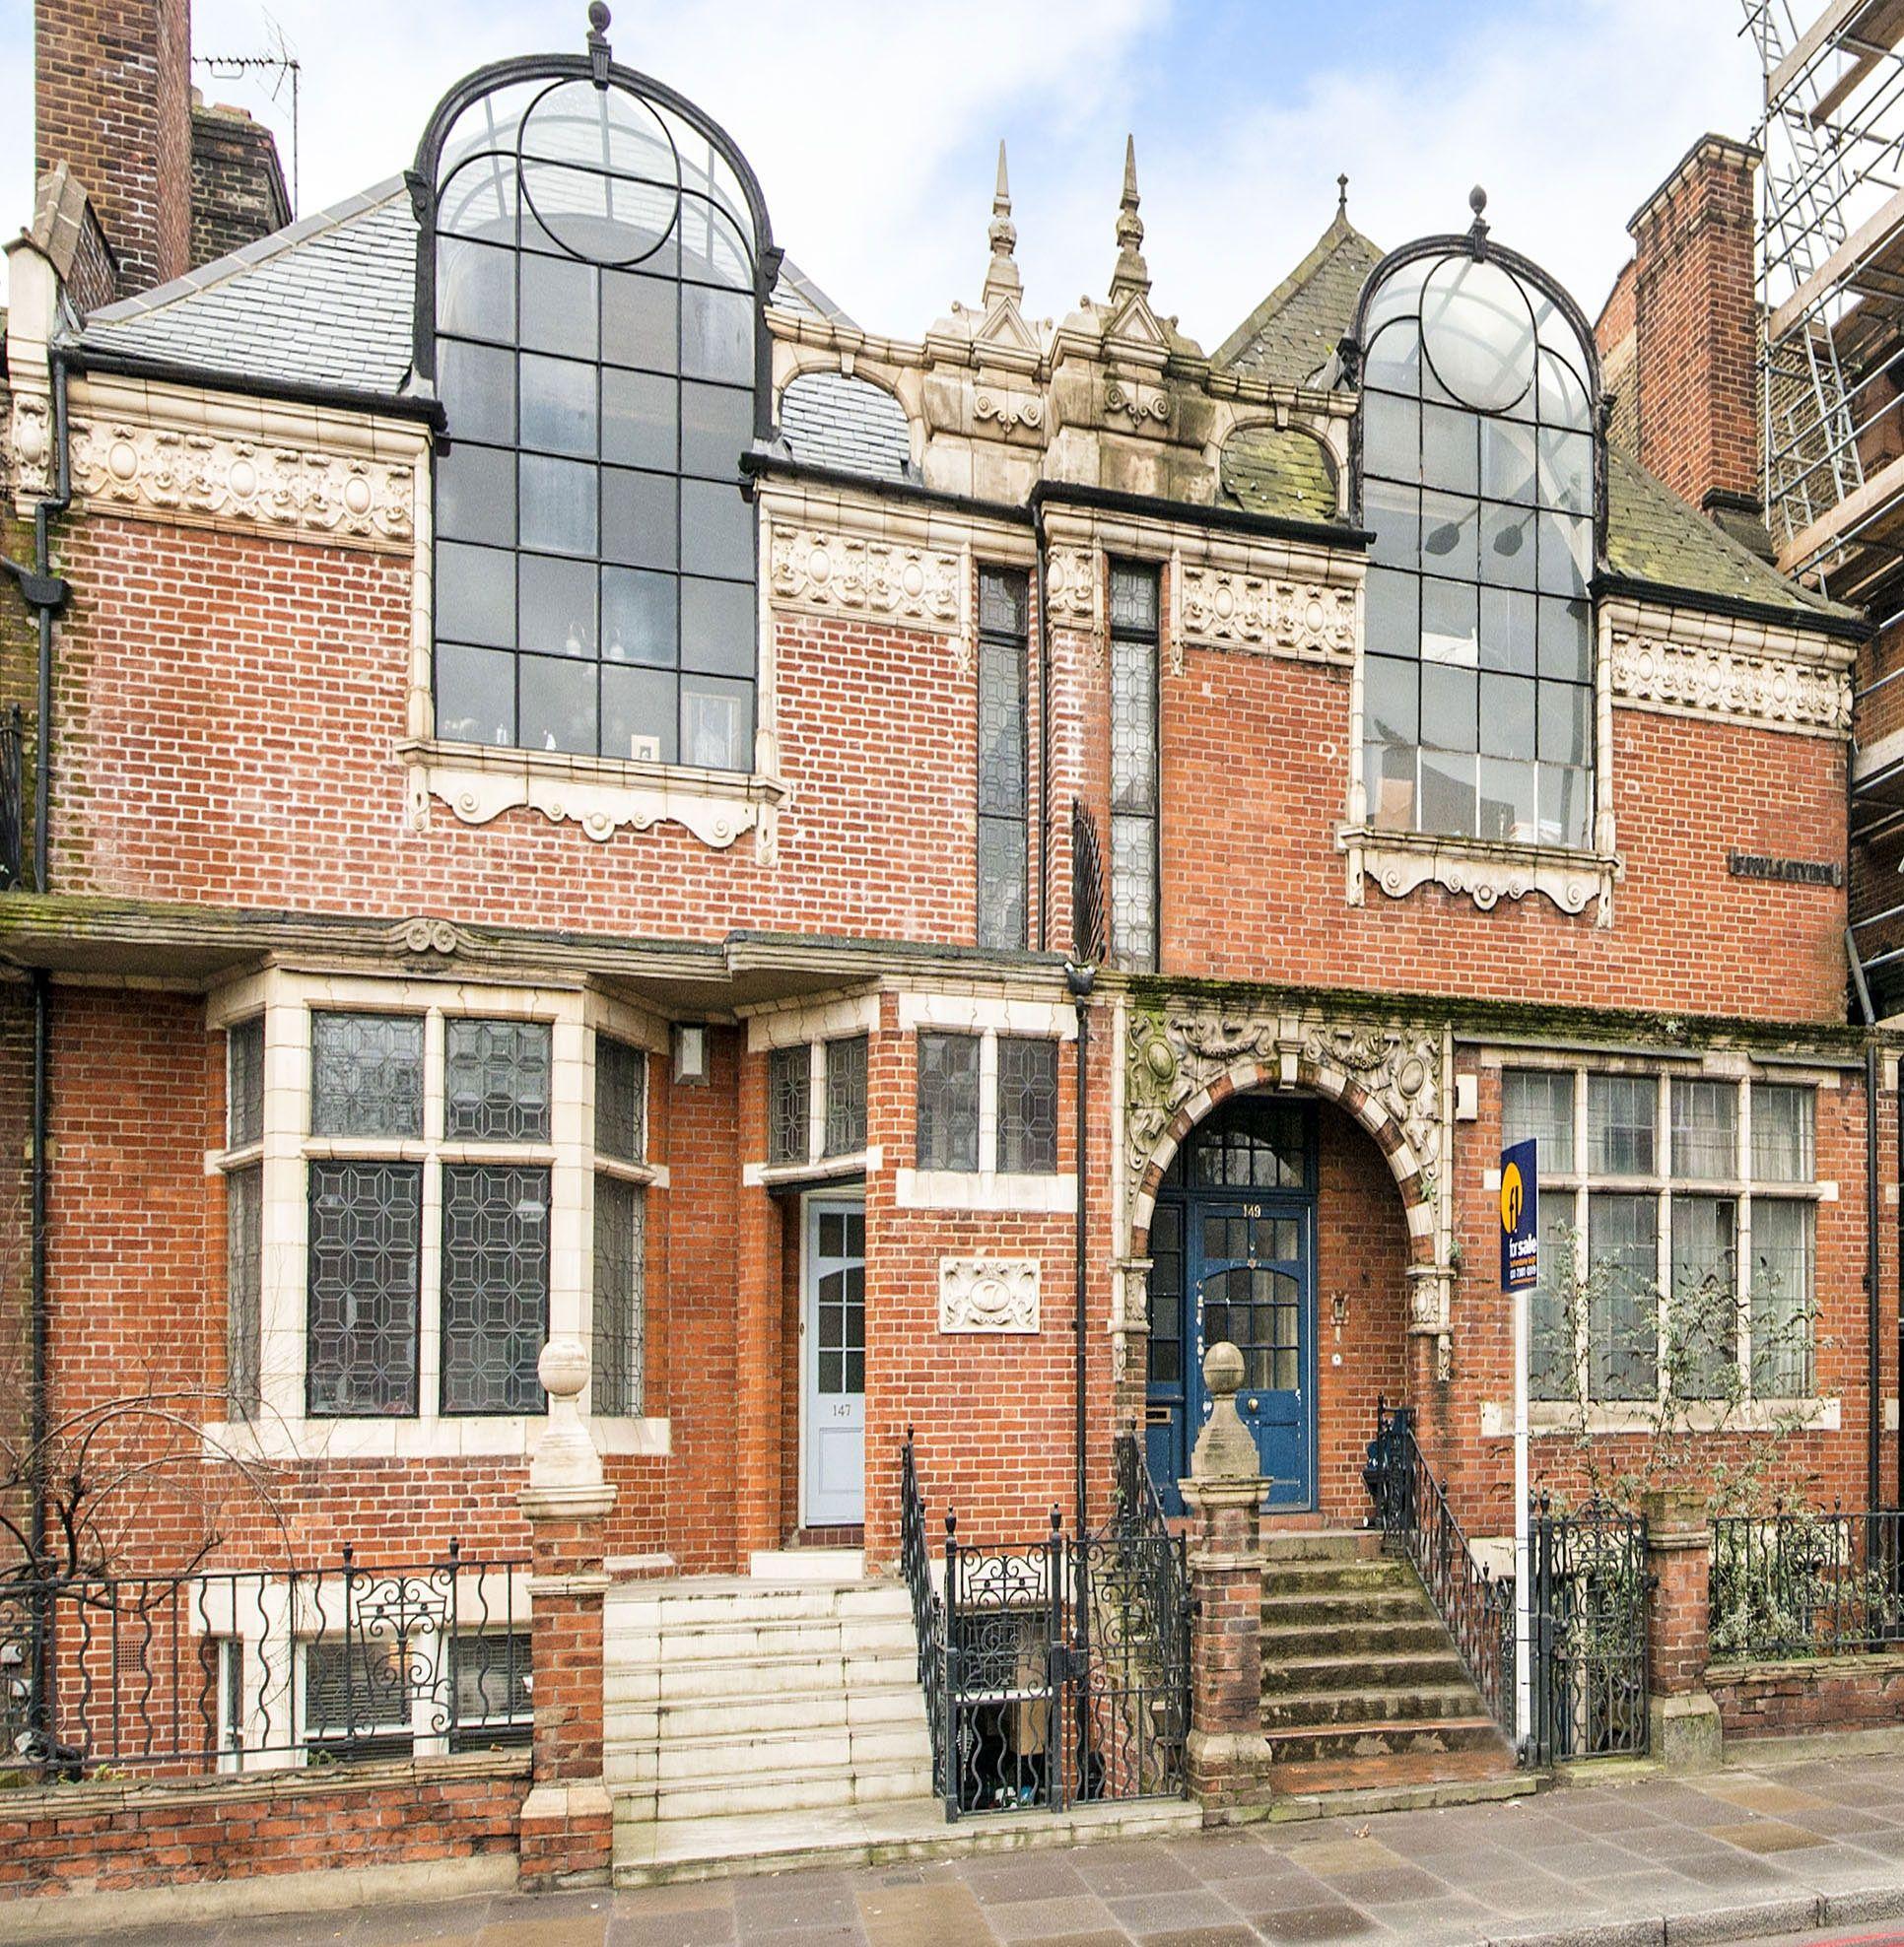 For sale Margot Fonteyn's Arts and Crafts livein studio